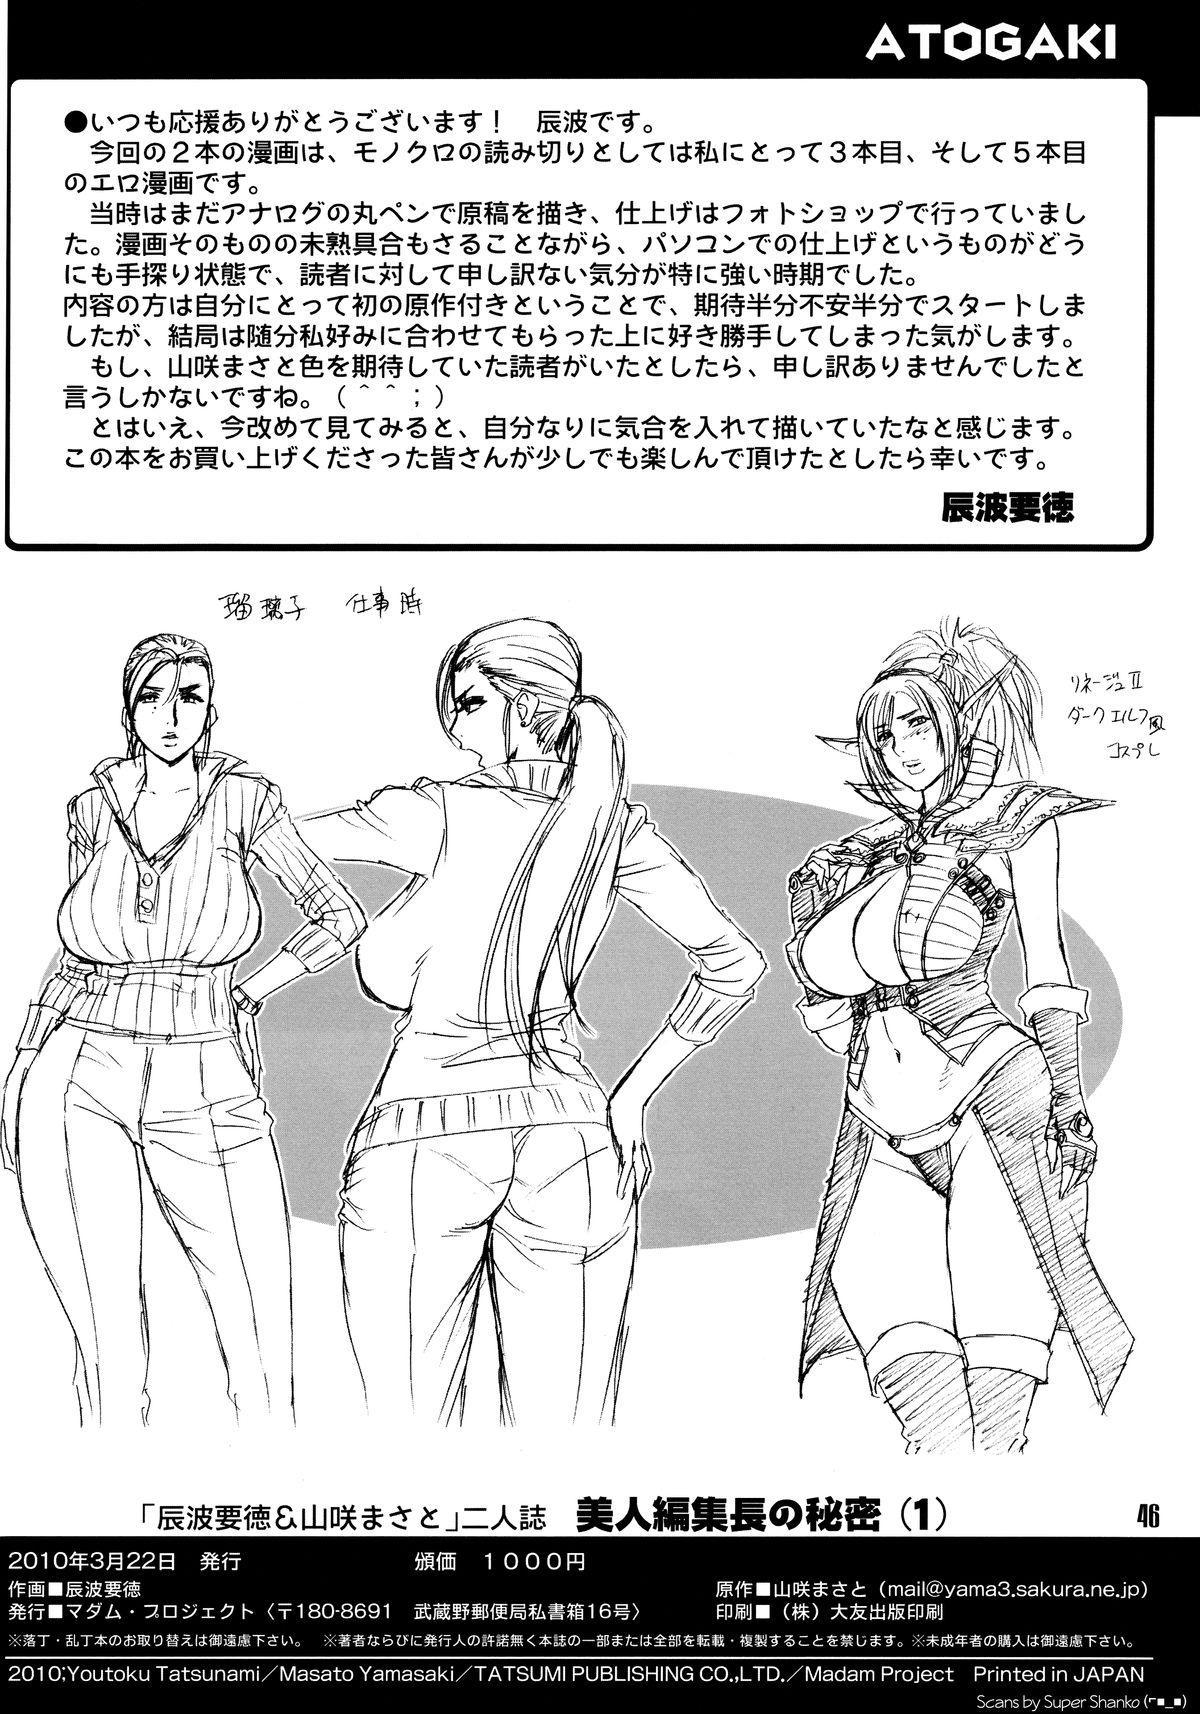 [Madam Project (Tatsunami Youtoku)] Bijin Henshuu-chou no Himitsu (1)   Beautiful Editor-in-Chief's Secret (1) [English] [Forbiddenfetish77] [Decensored] 42